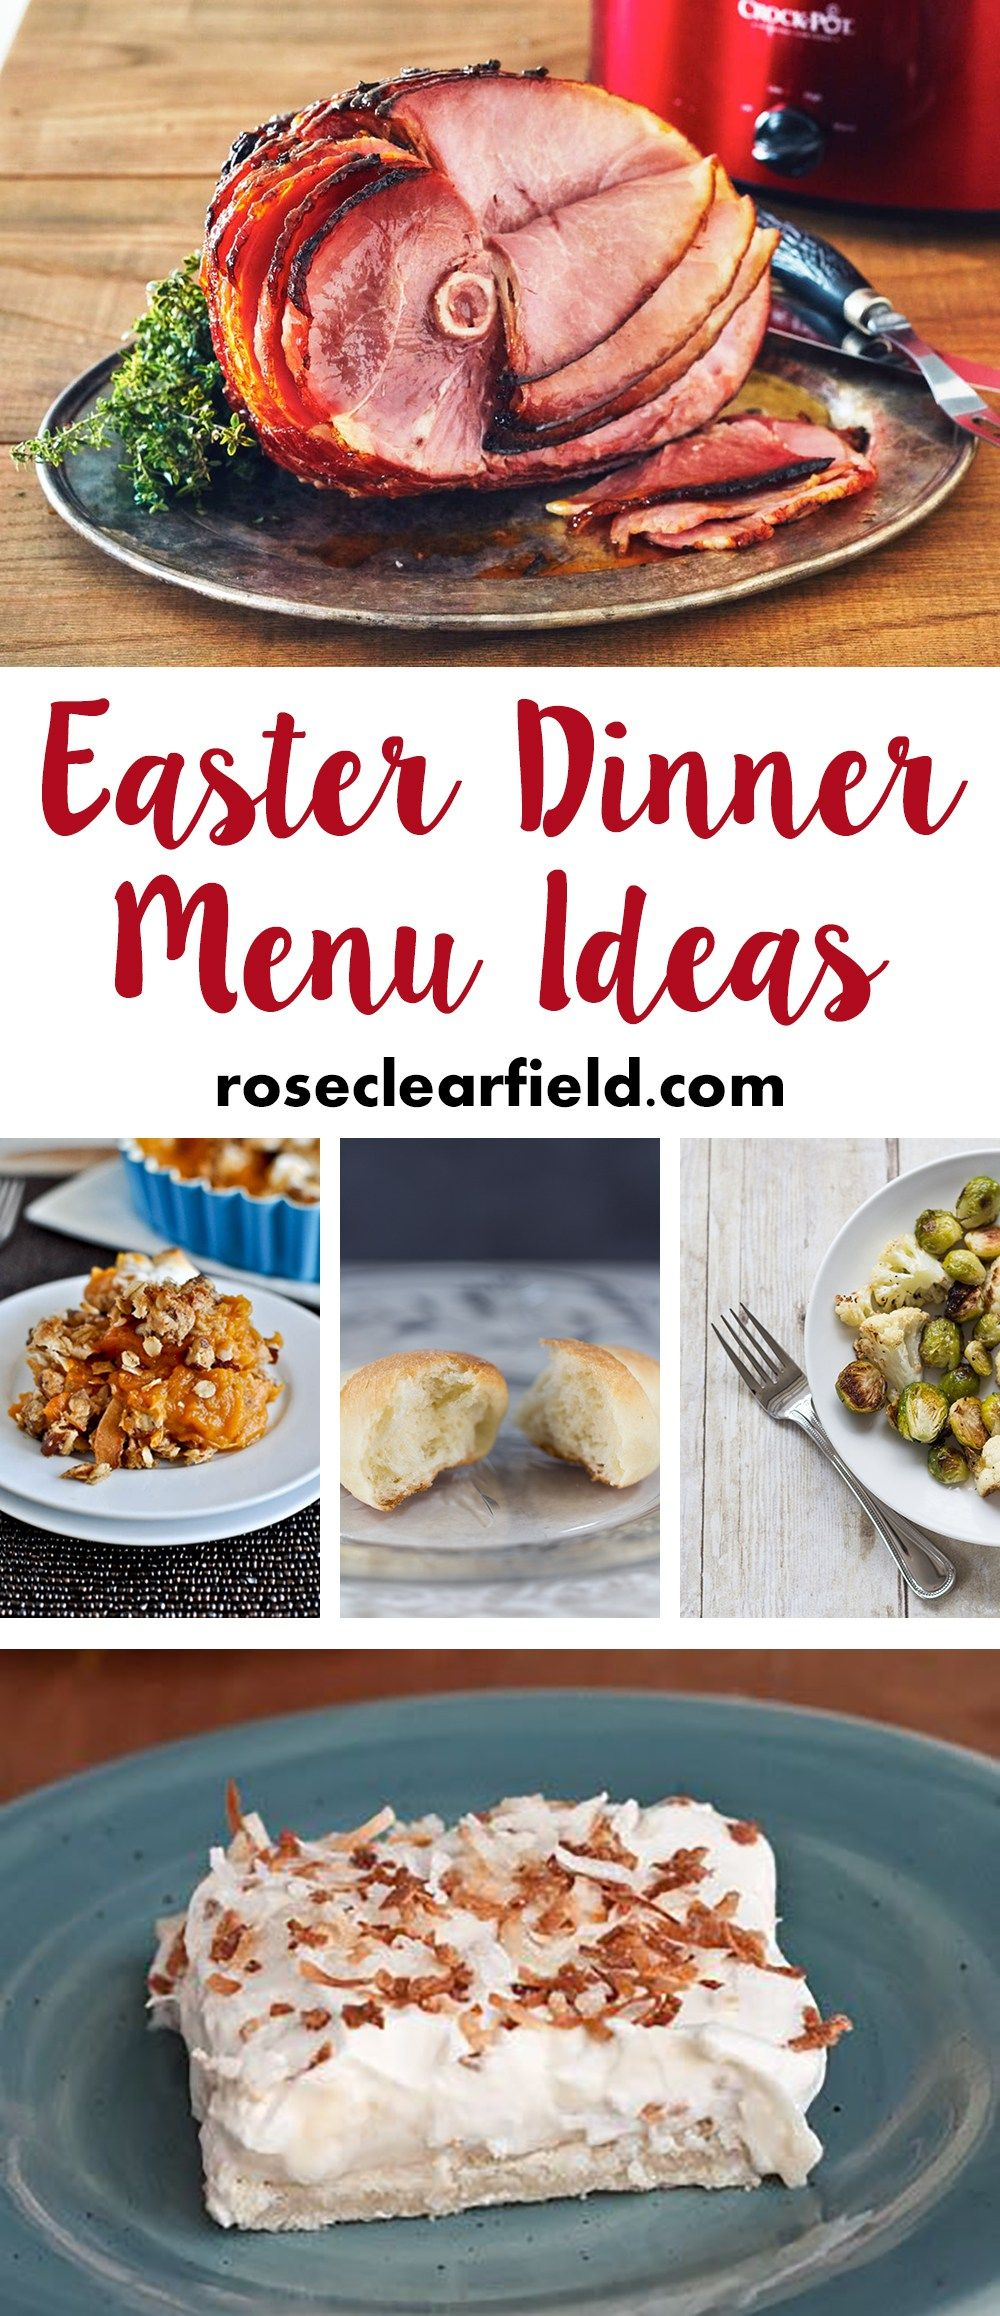 Photo of Easter Dinner Menu Ideas